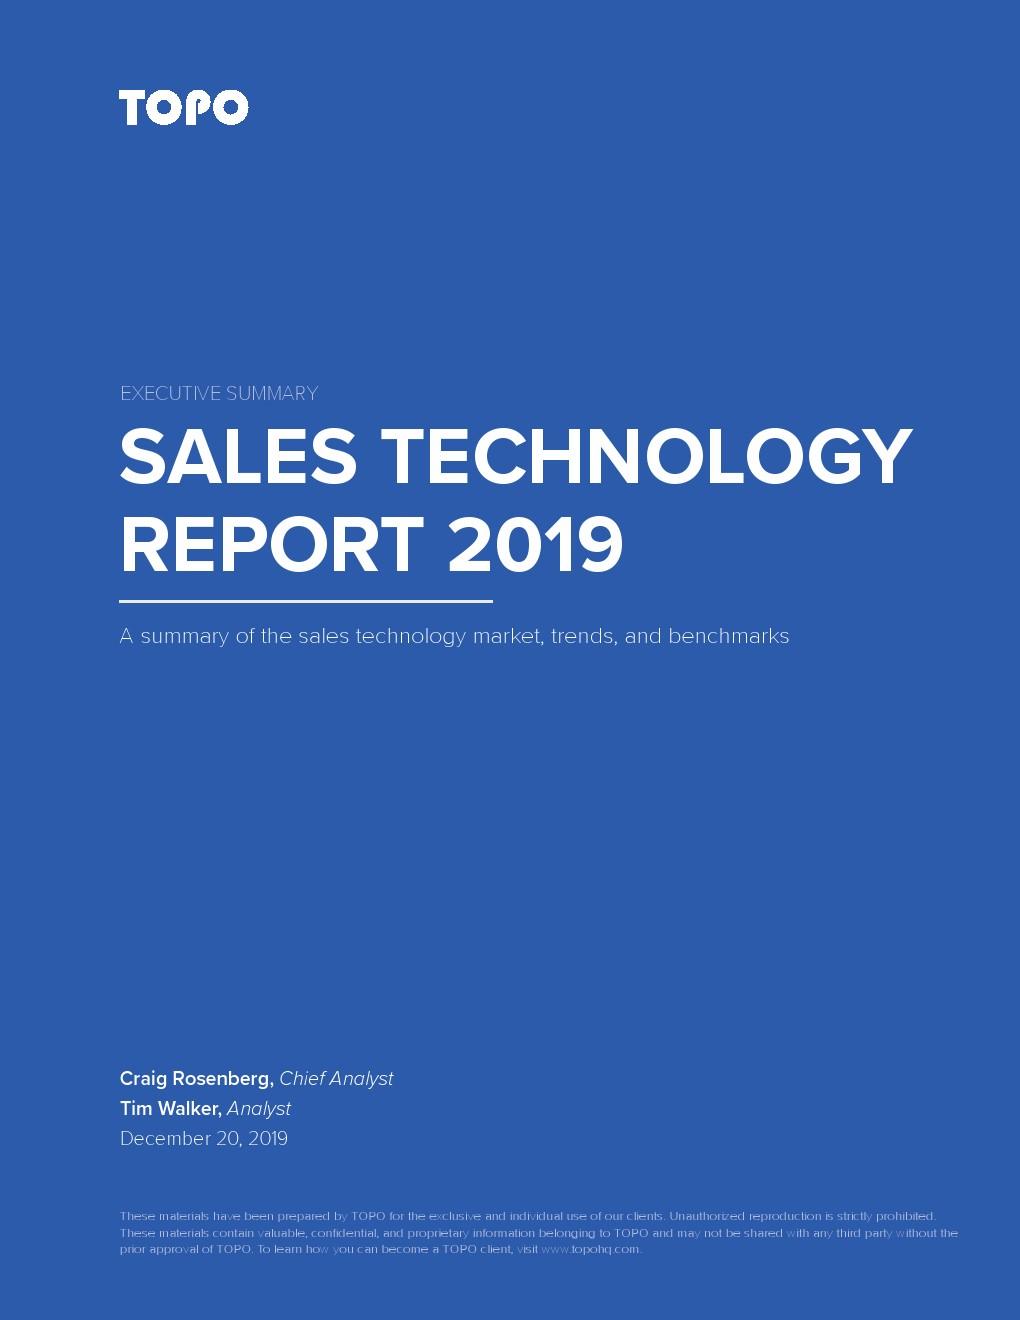 Topo:2019年销售技术报告